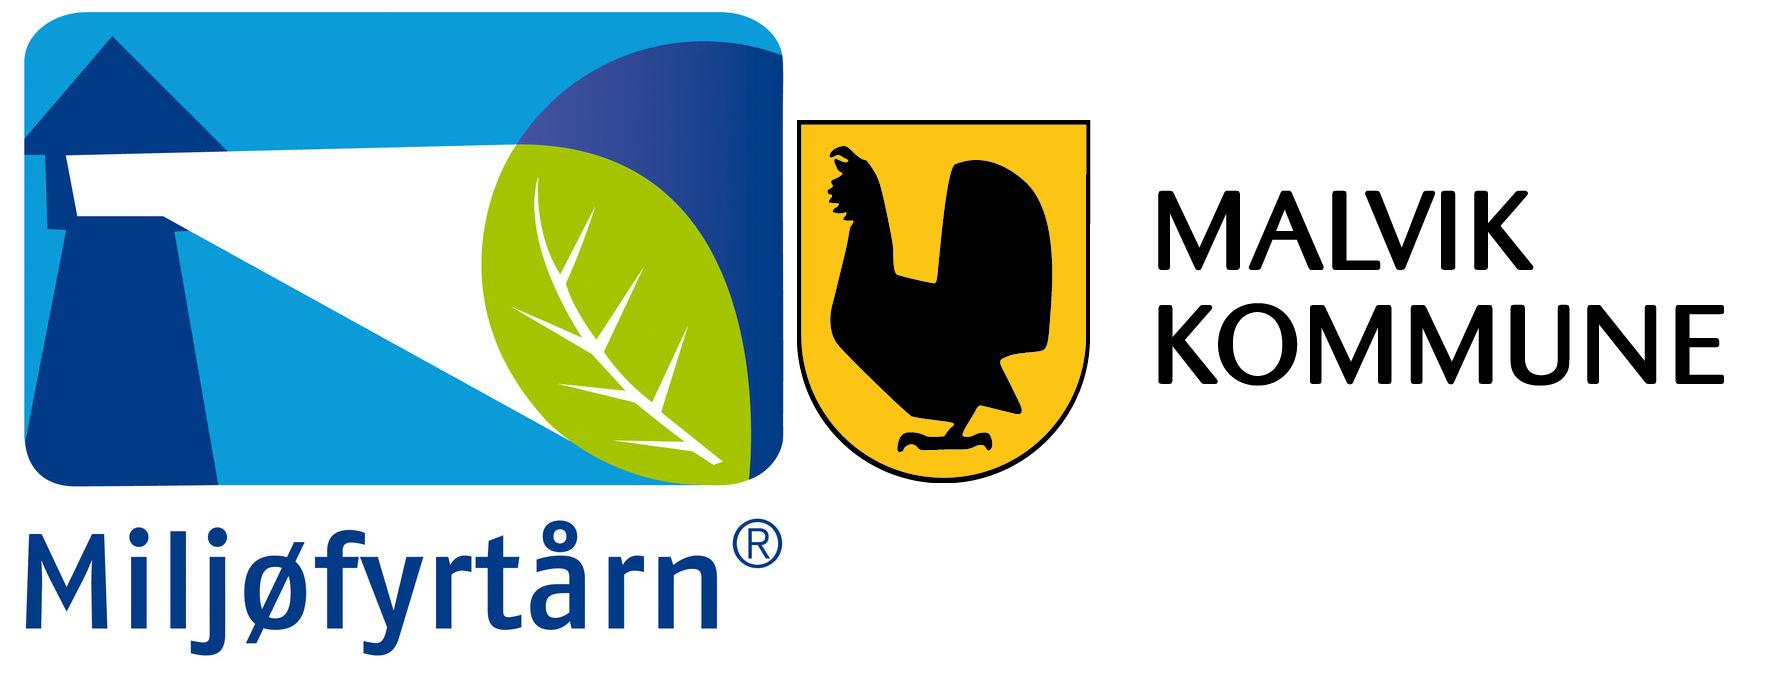 Miljøsertifisering i Malvik kommune